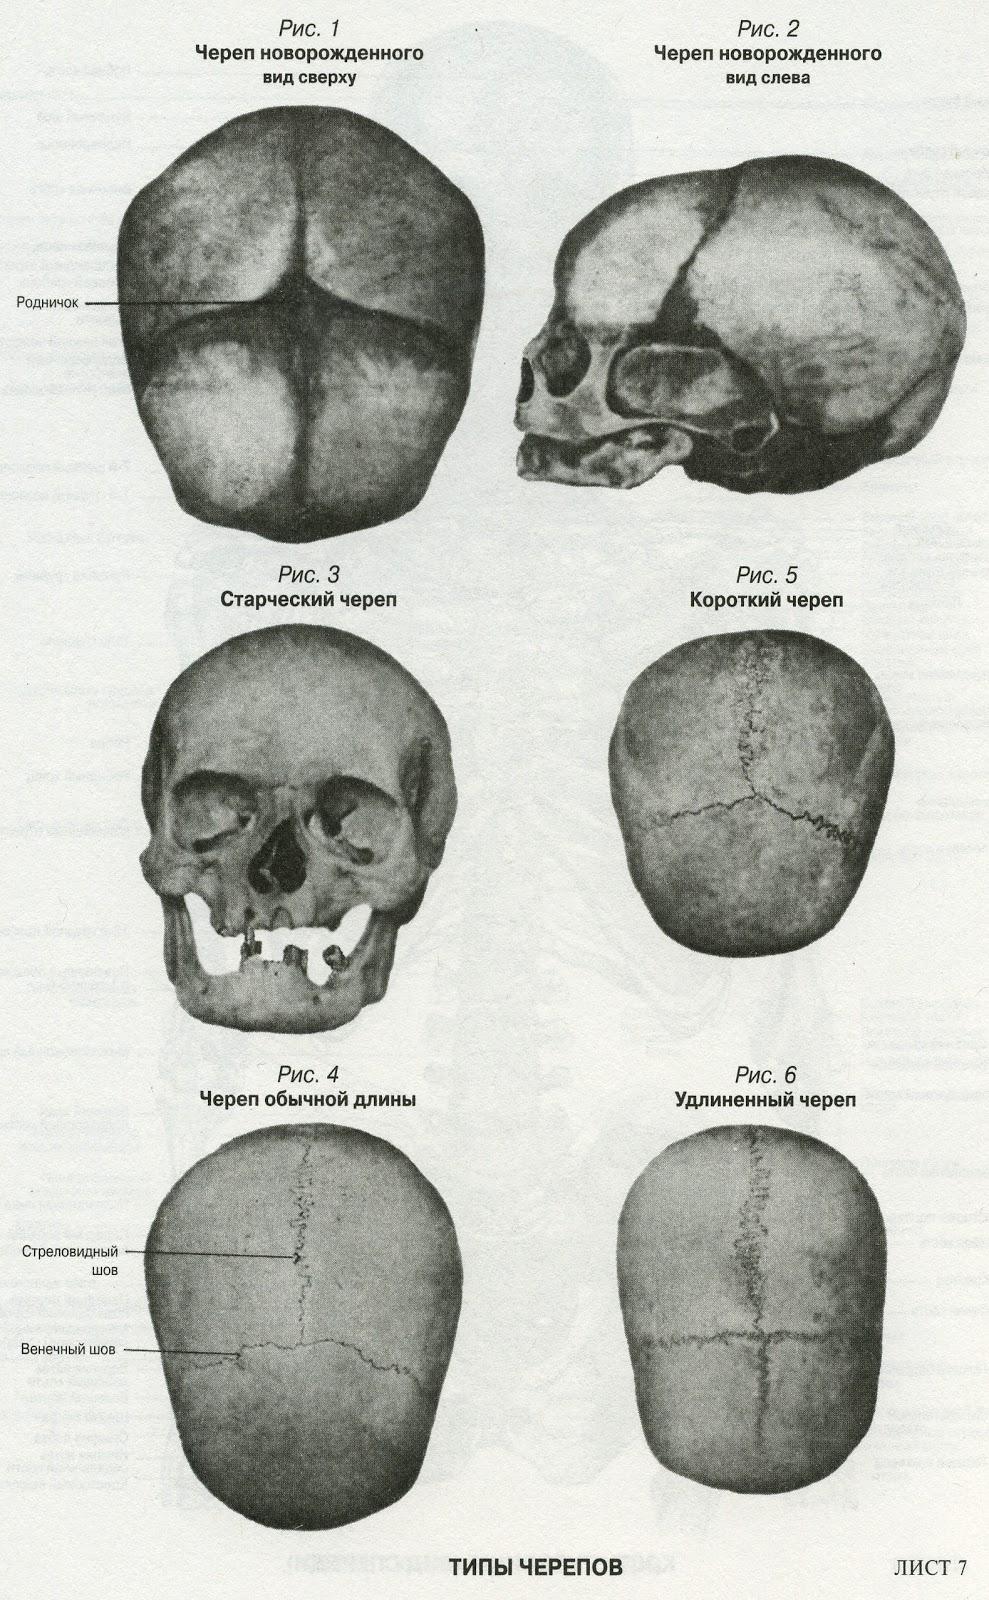 Малыш на приеме у невролога. Форма и размер 38